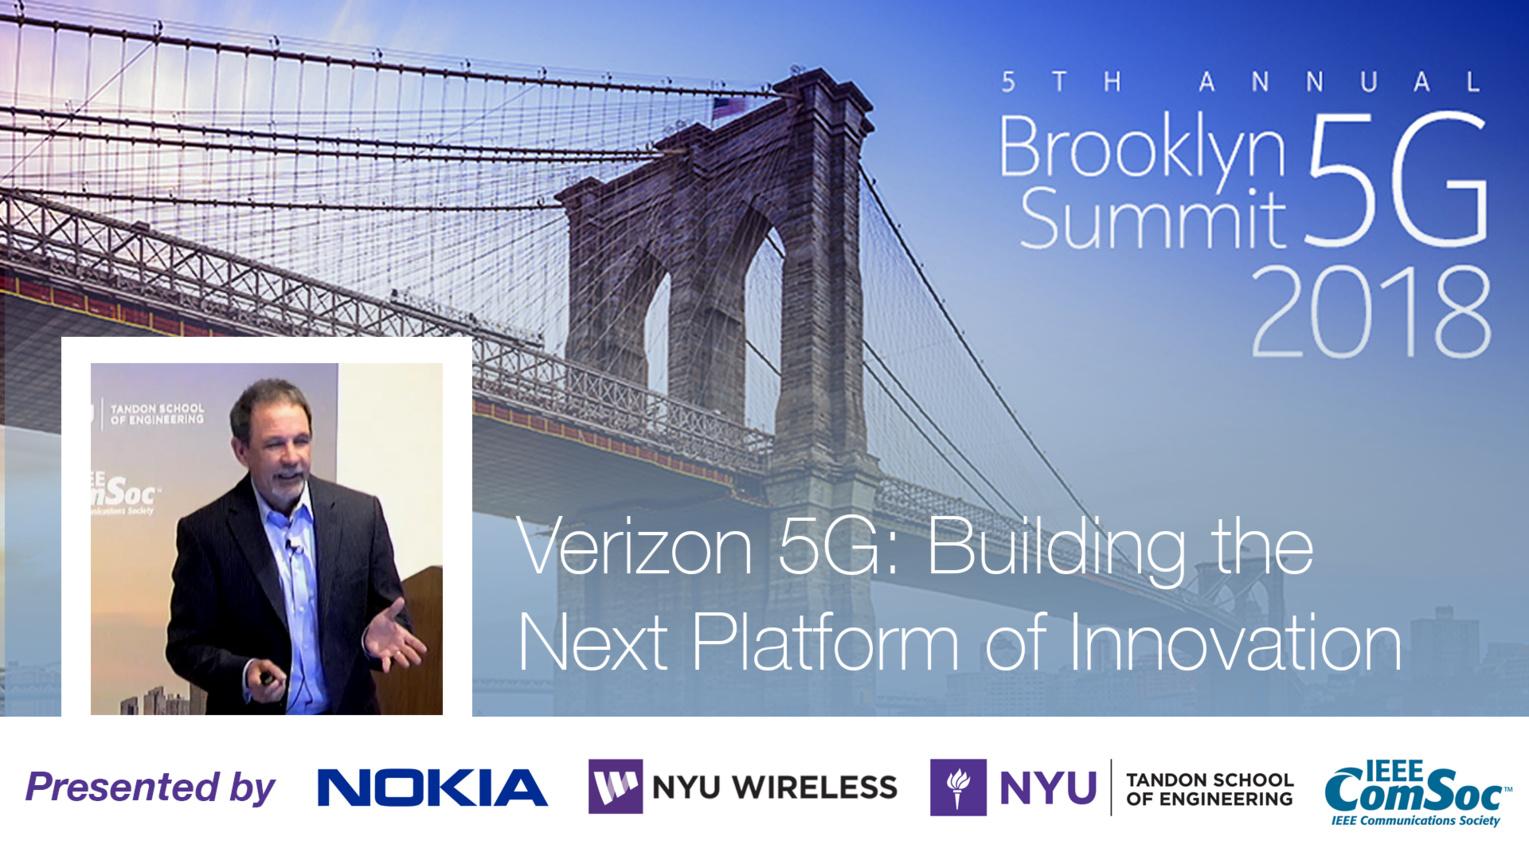 Verizon 5G: Building the Platform of Innovation - Bill Stone -  Brooklyn 5G Summit 2018